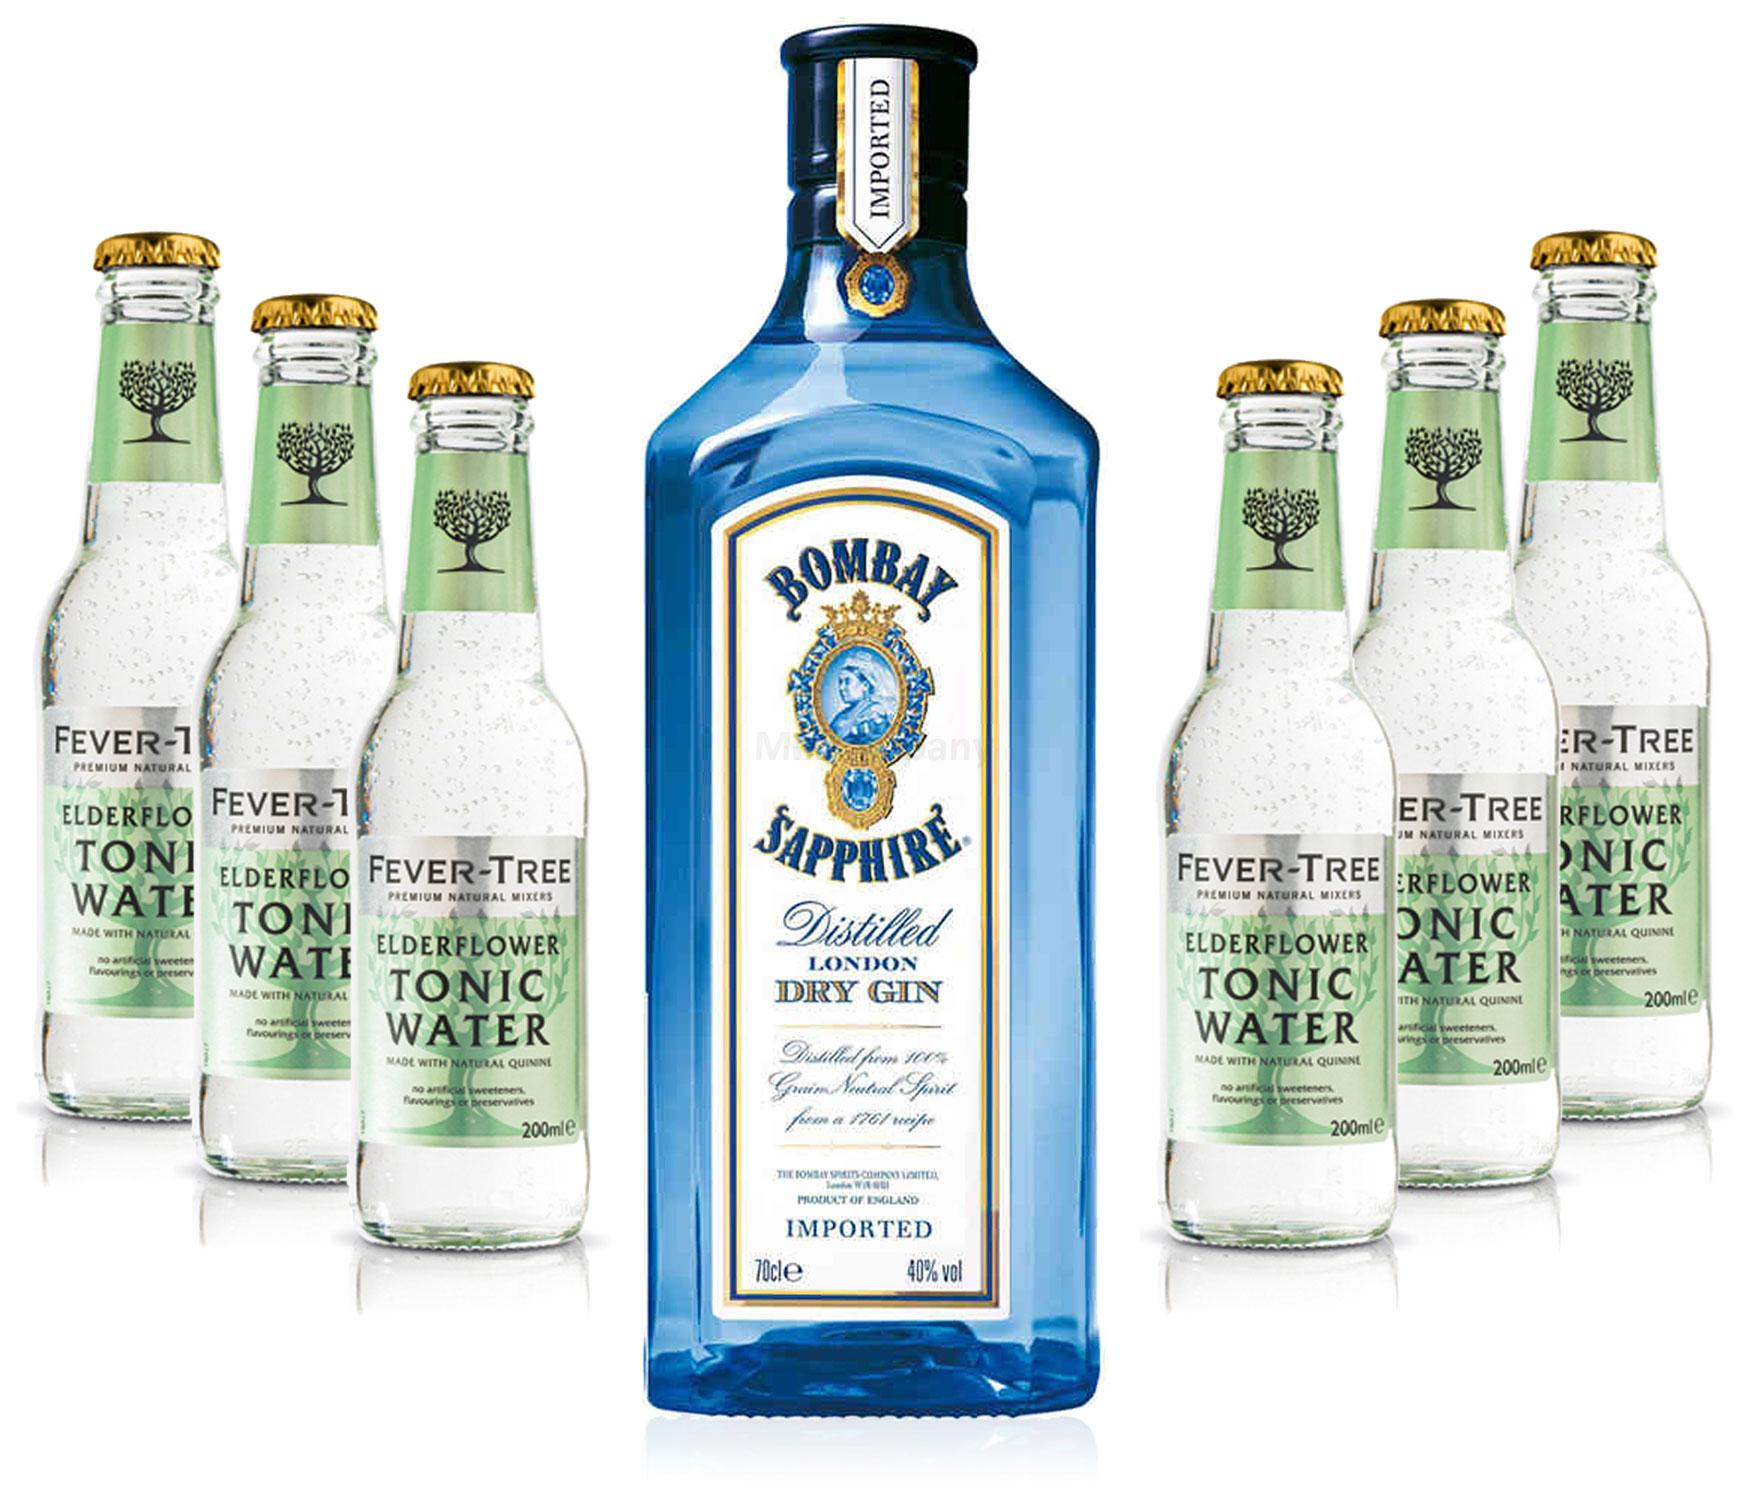 Gin Tonic Set - Bombay Sapphire 0,7l 700ml (40% Vol) + 6x Fever Tree Elderflower Tonic Water 200ml - Inkl. Pfand MEHRWEG